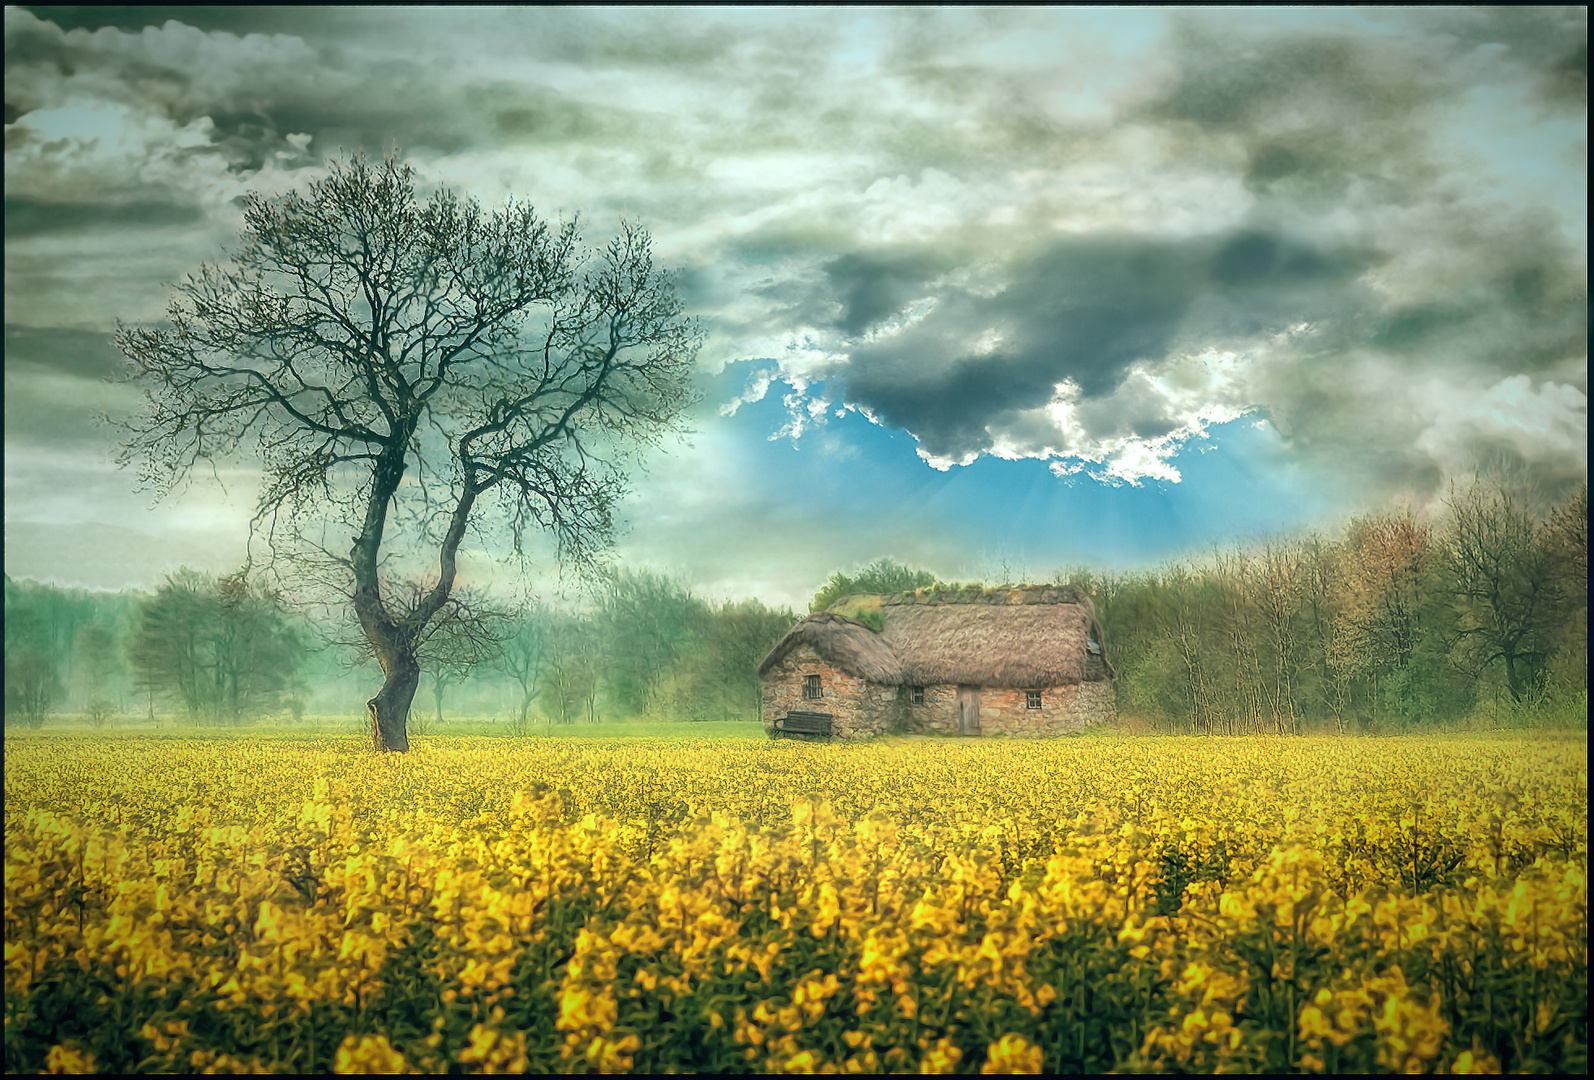 Rapsfeld mit Haus